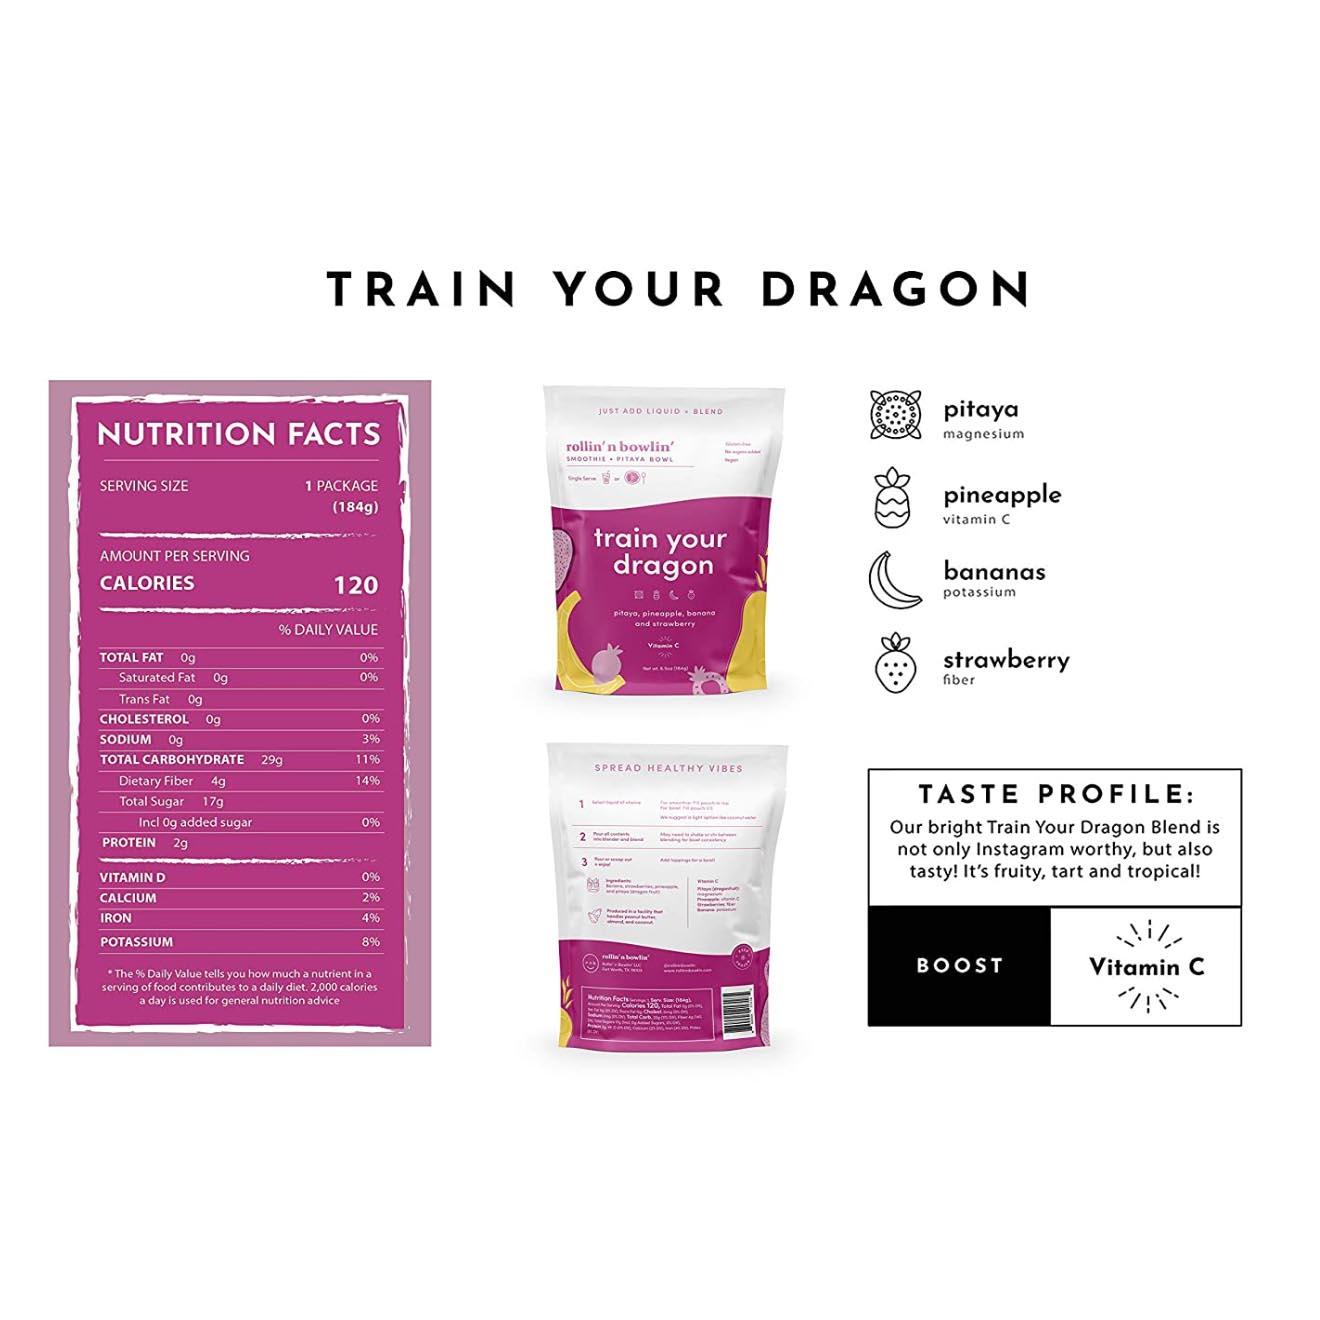 Train Your Dragon